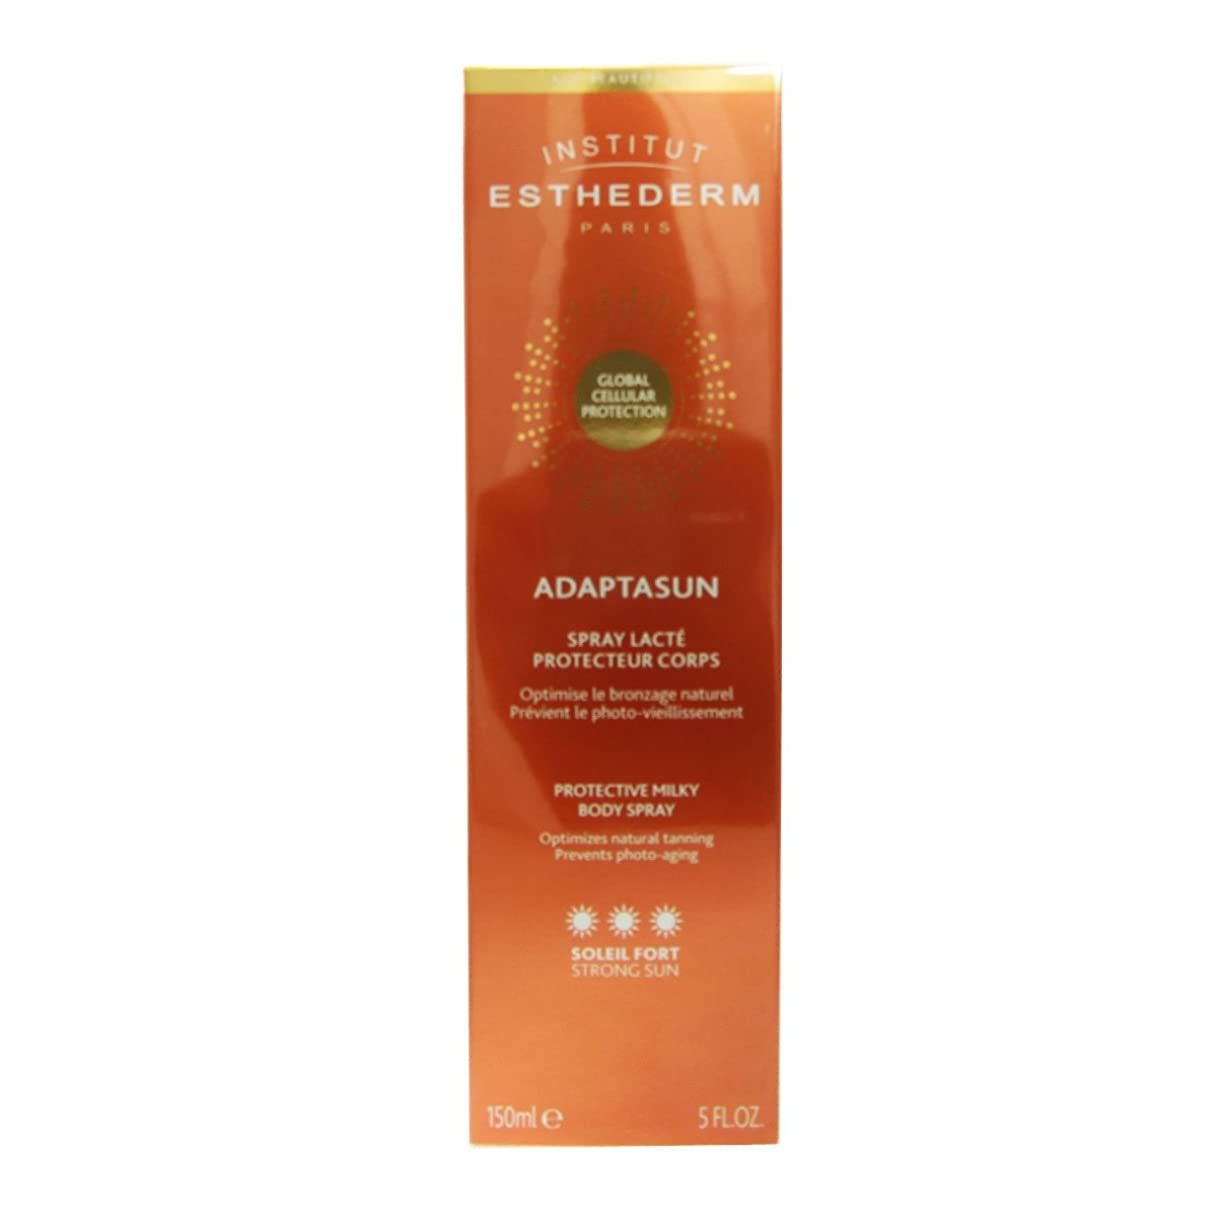 Institut Esthederm Adaptasun Protective Milky Body Spray Strong Sun 150ml [並行輸入品]